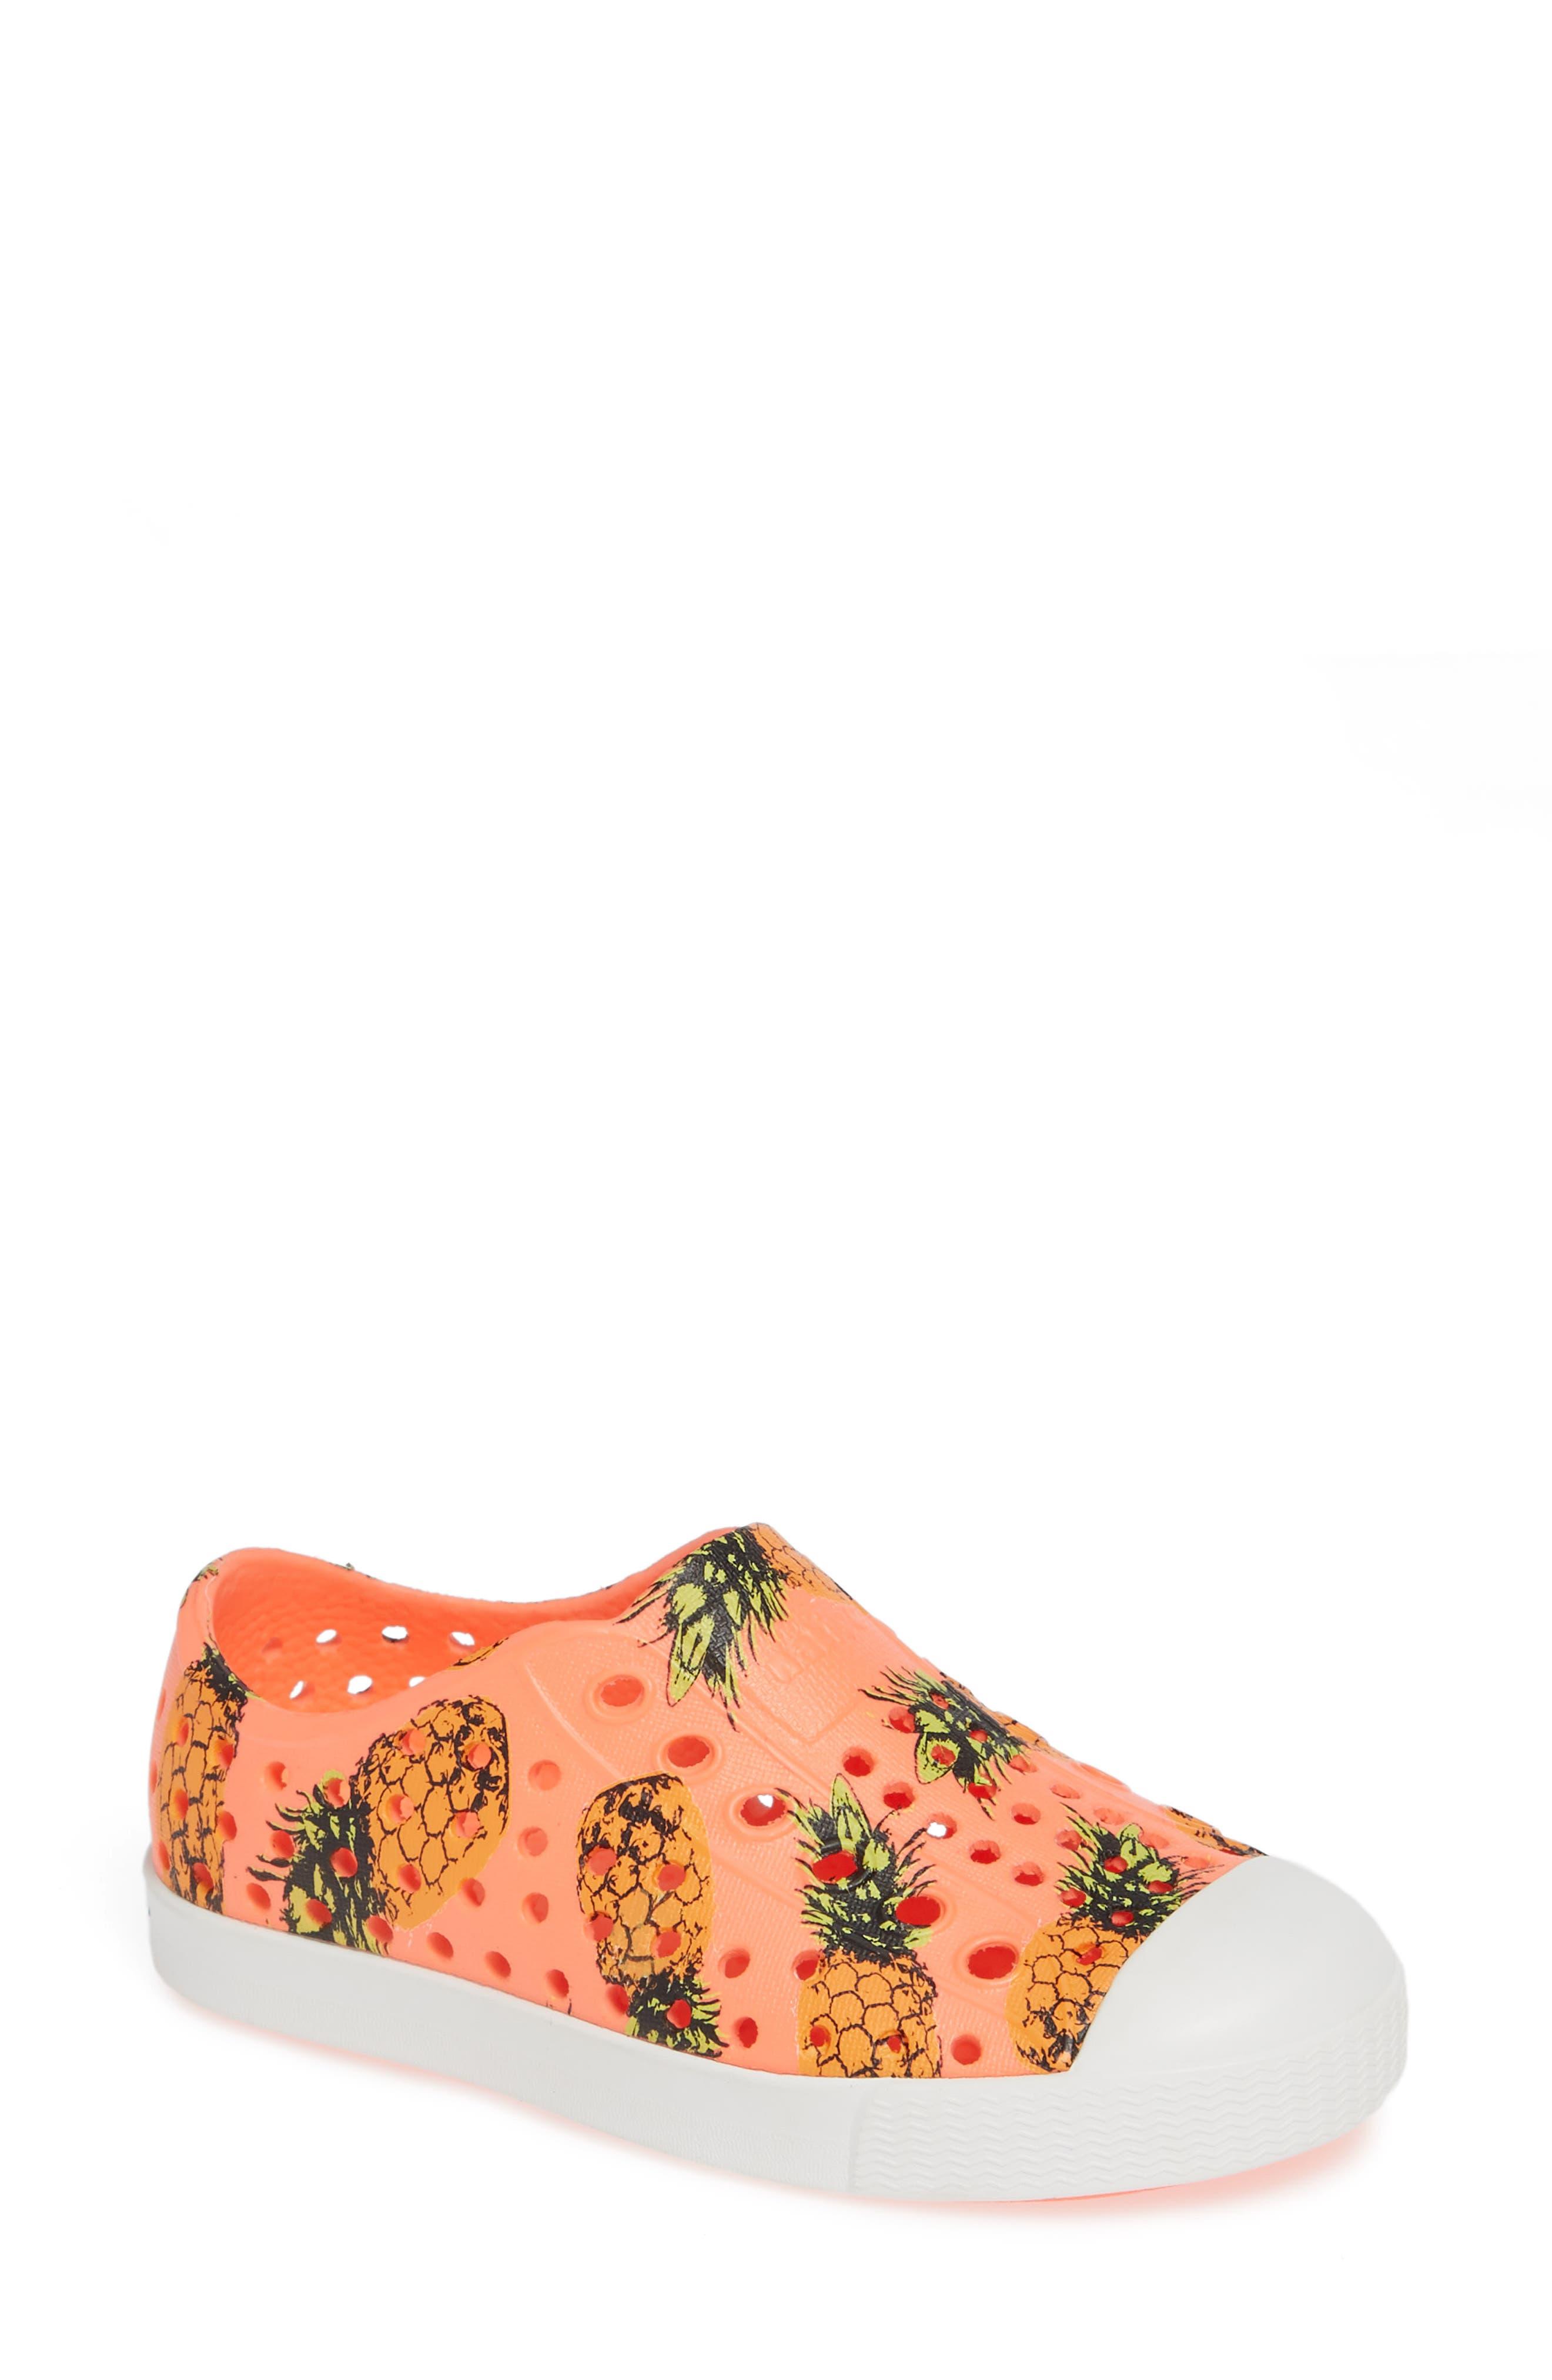 Jefferson Quartz Slip-On Sneaker,                         Main,                         color, 725